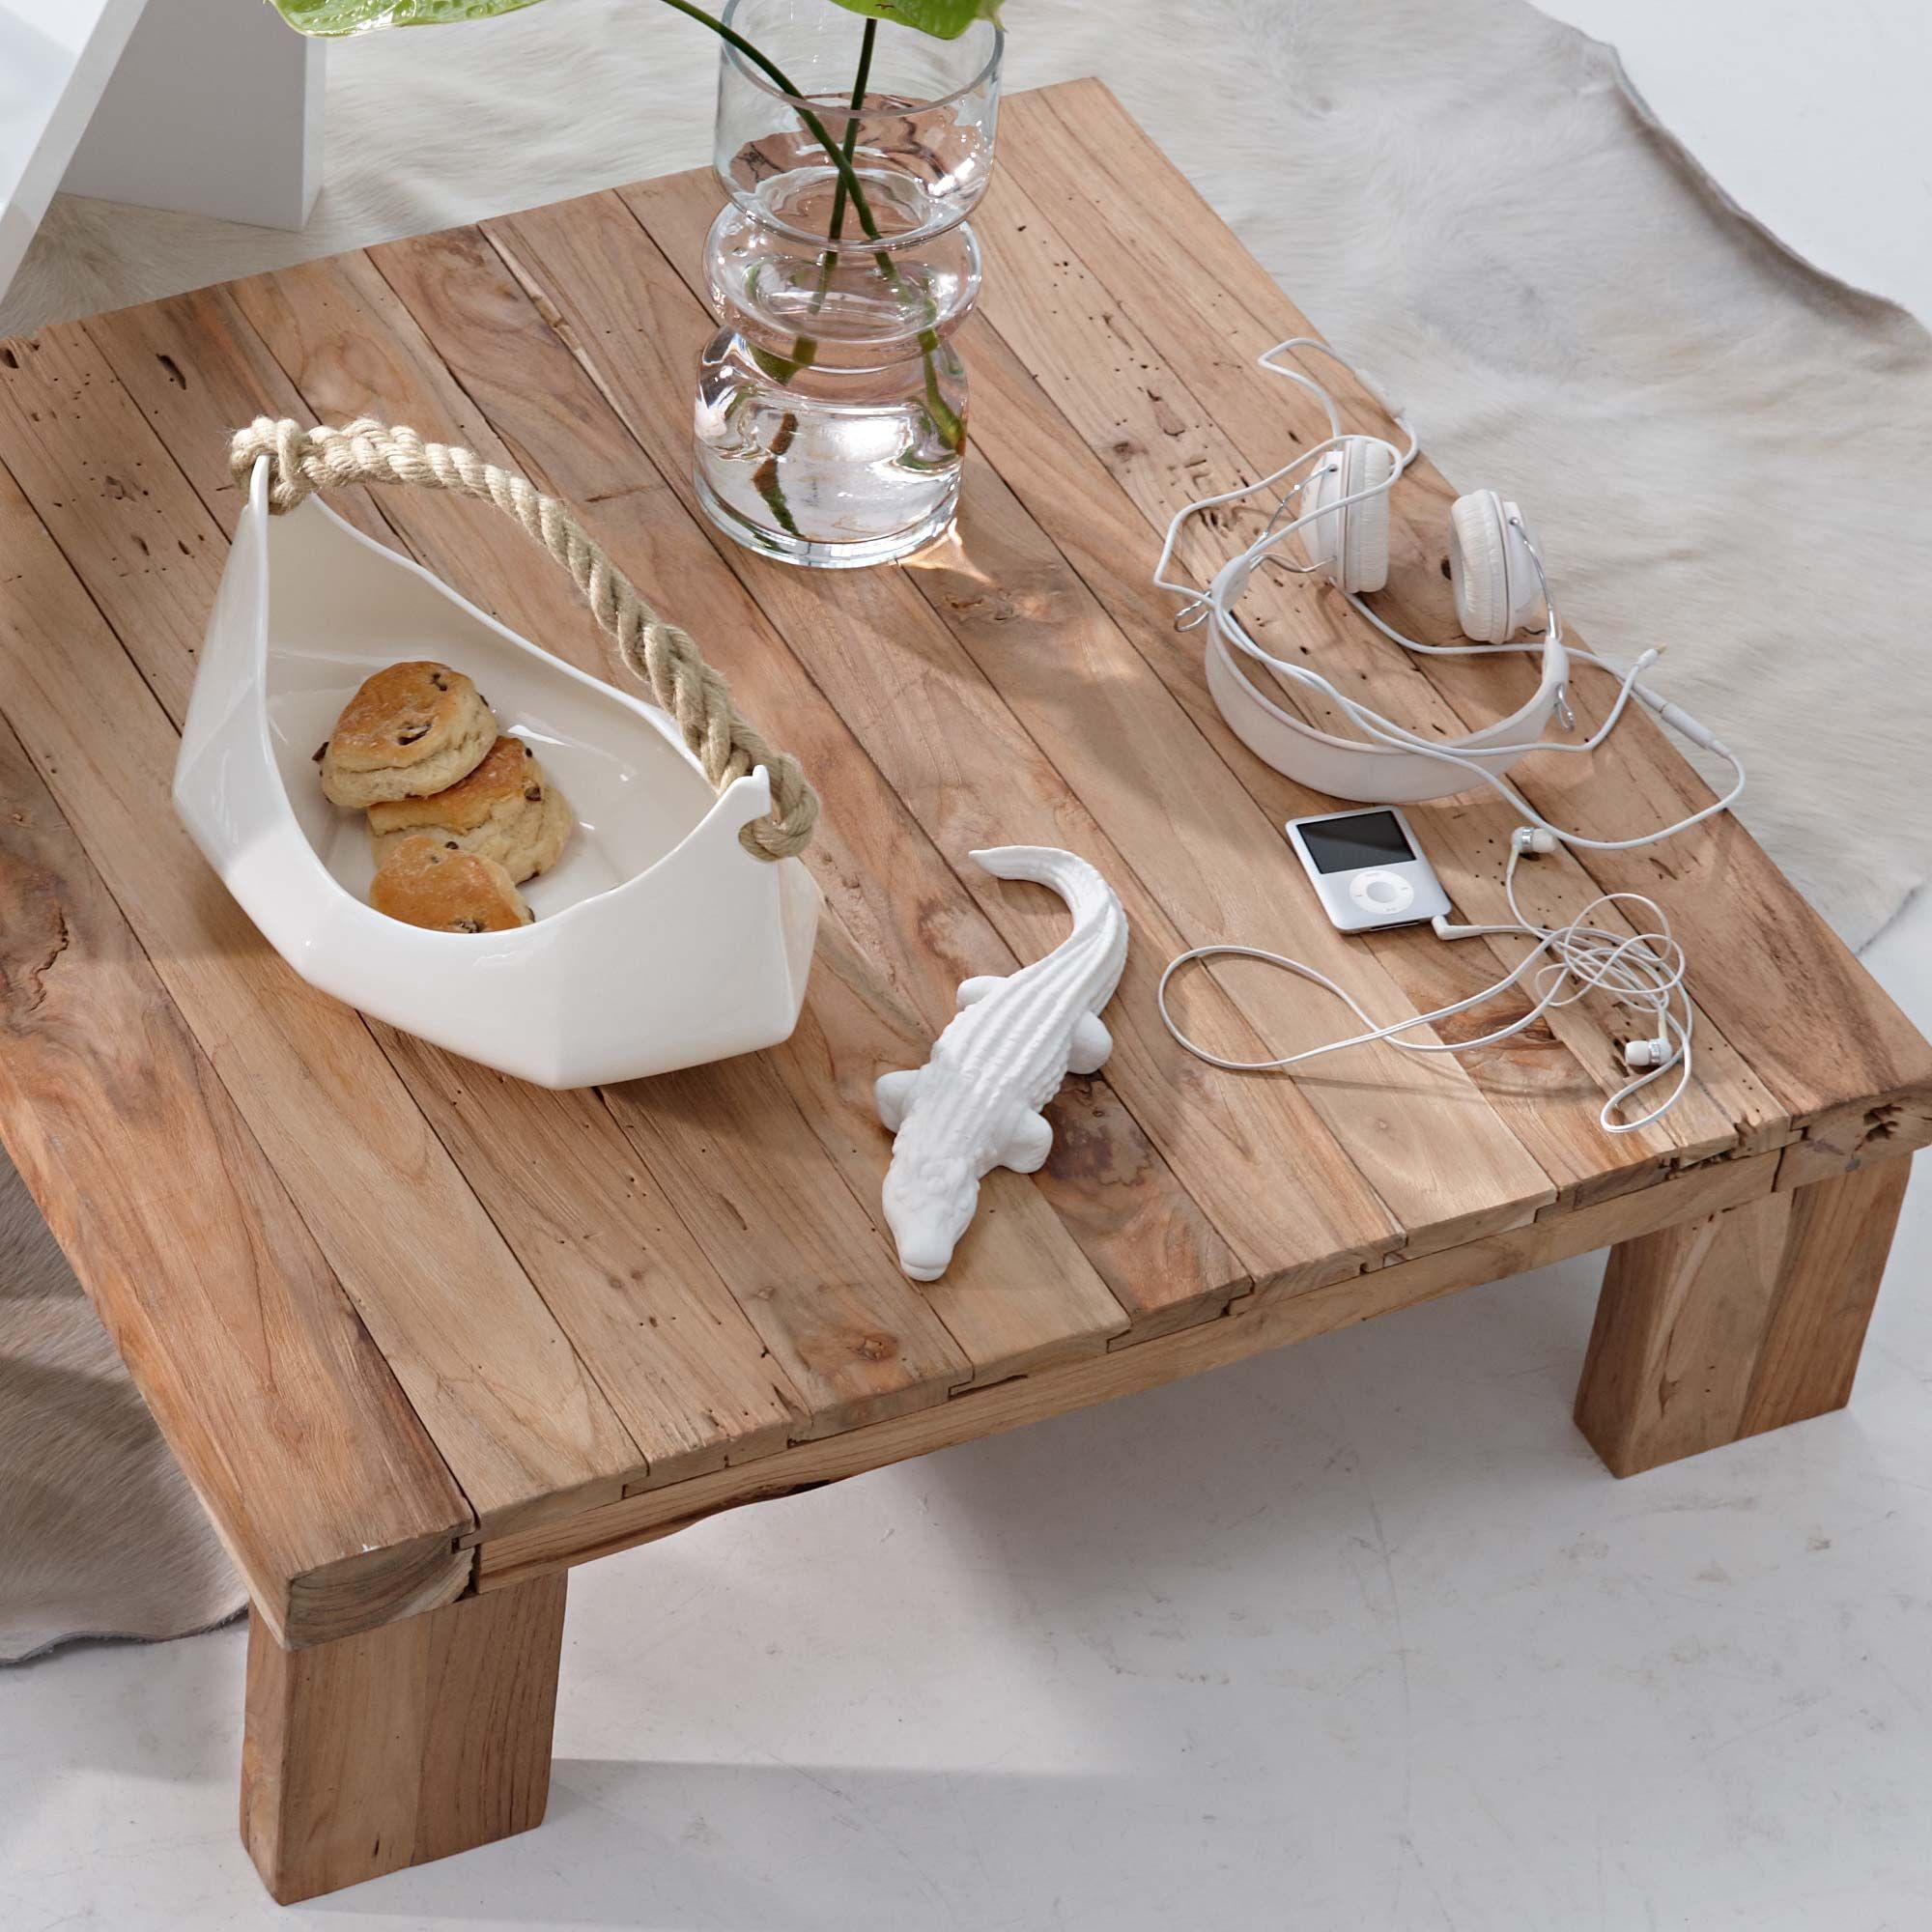 couchtisch dream home pinterest. Black Bedroom Furniture Sets. Home Design Ideas